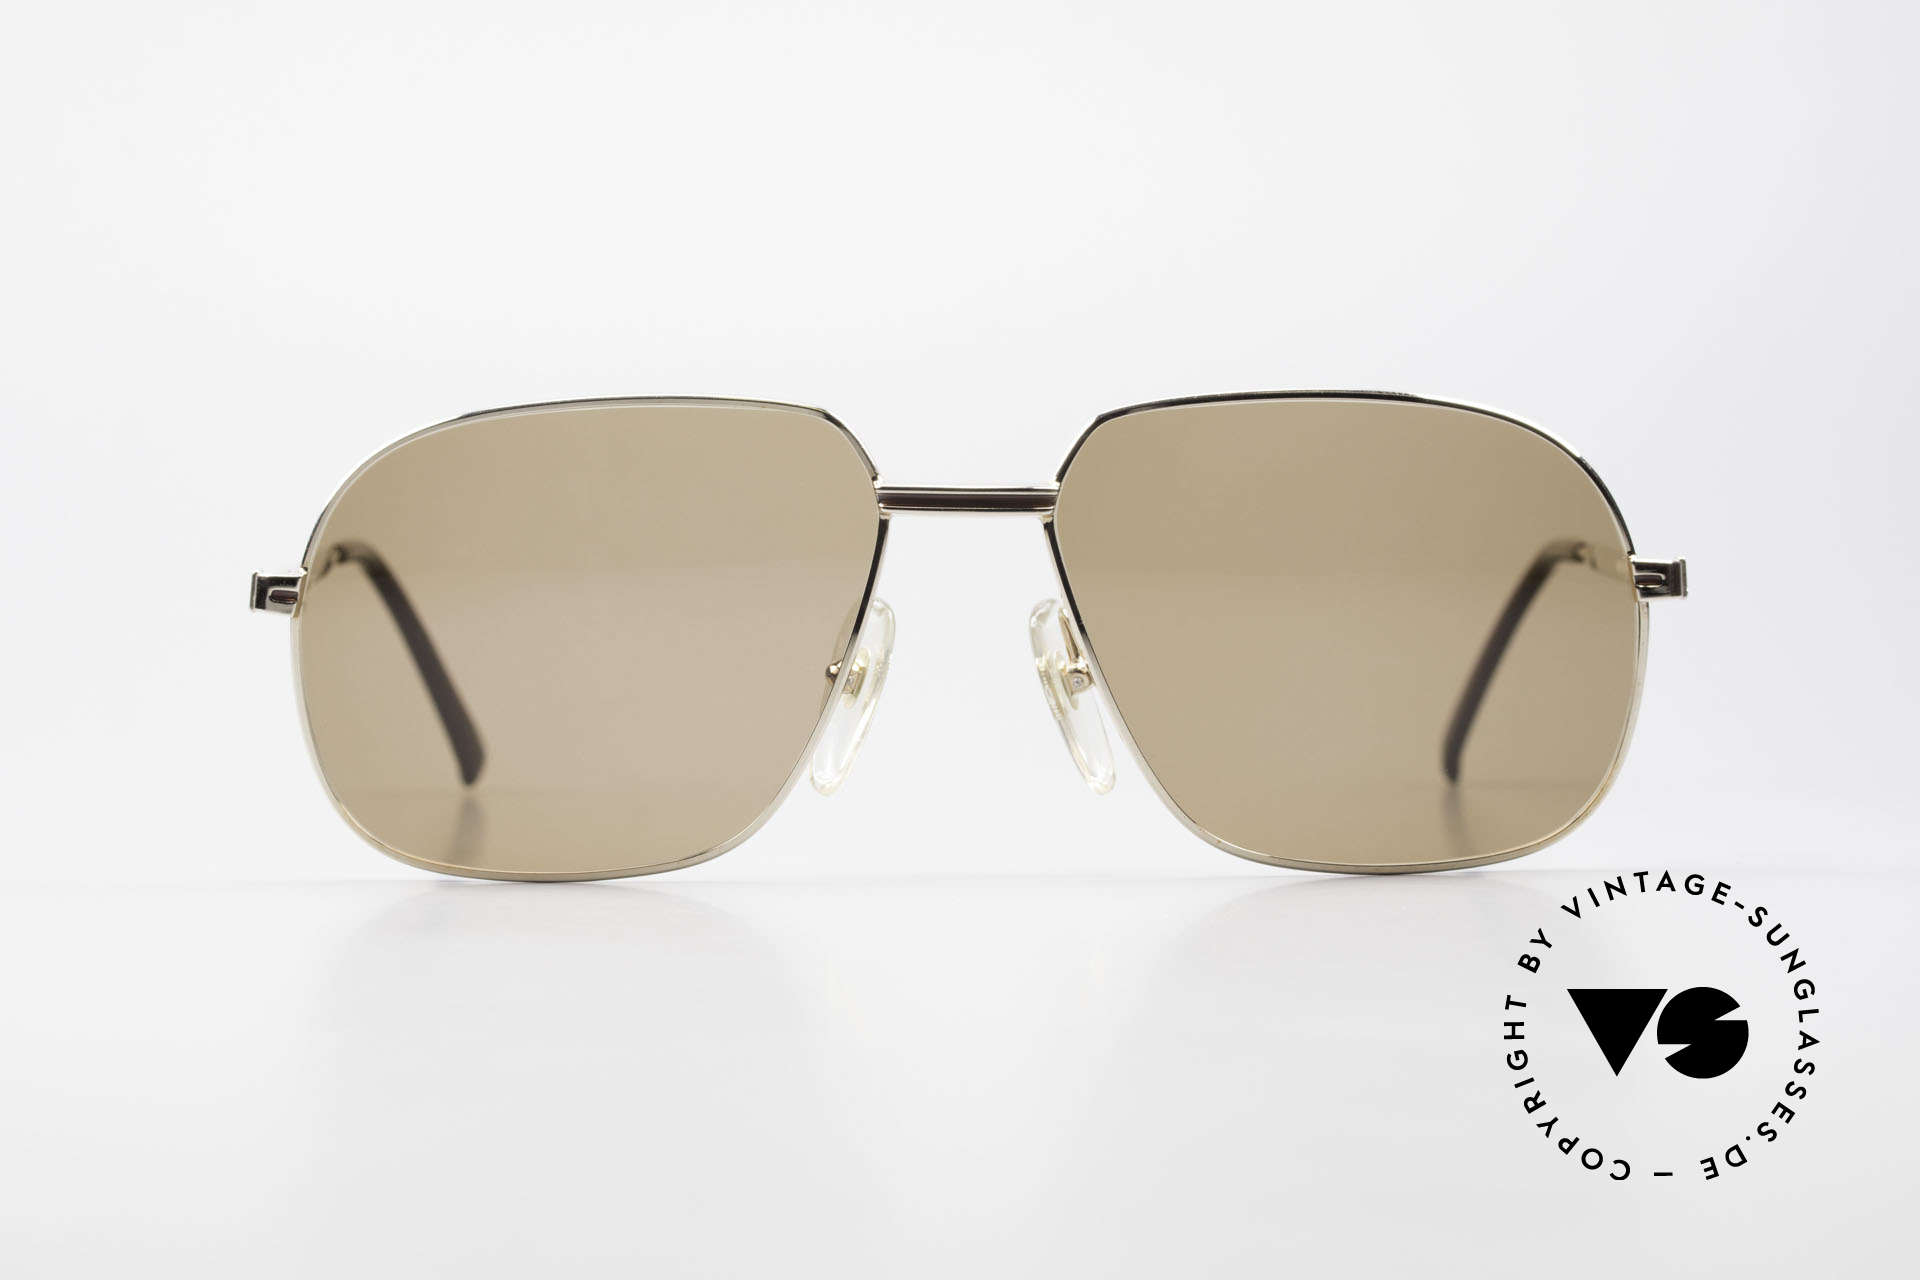 Dunhill 6123 Gold Plated Gentlemen's Frame, noble DUNHILL vintage 80's sunglasses for gentlemen, Made for Men